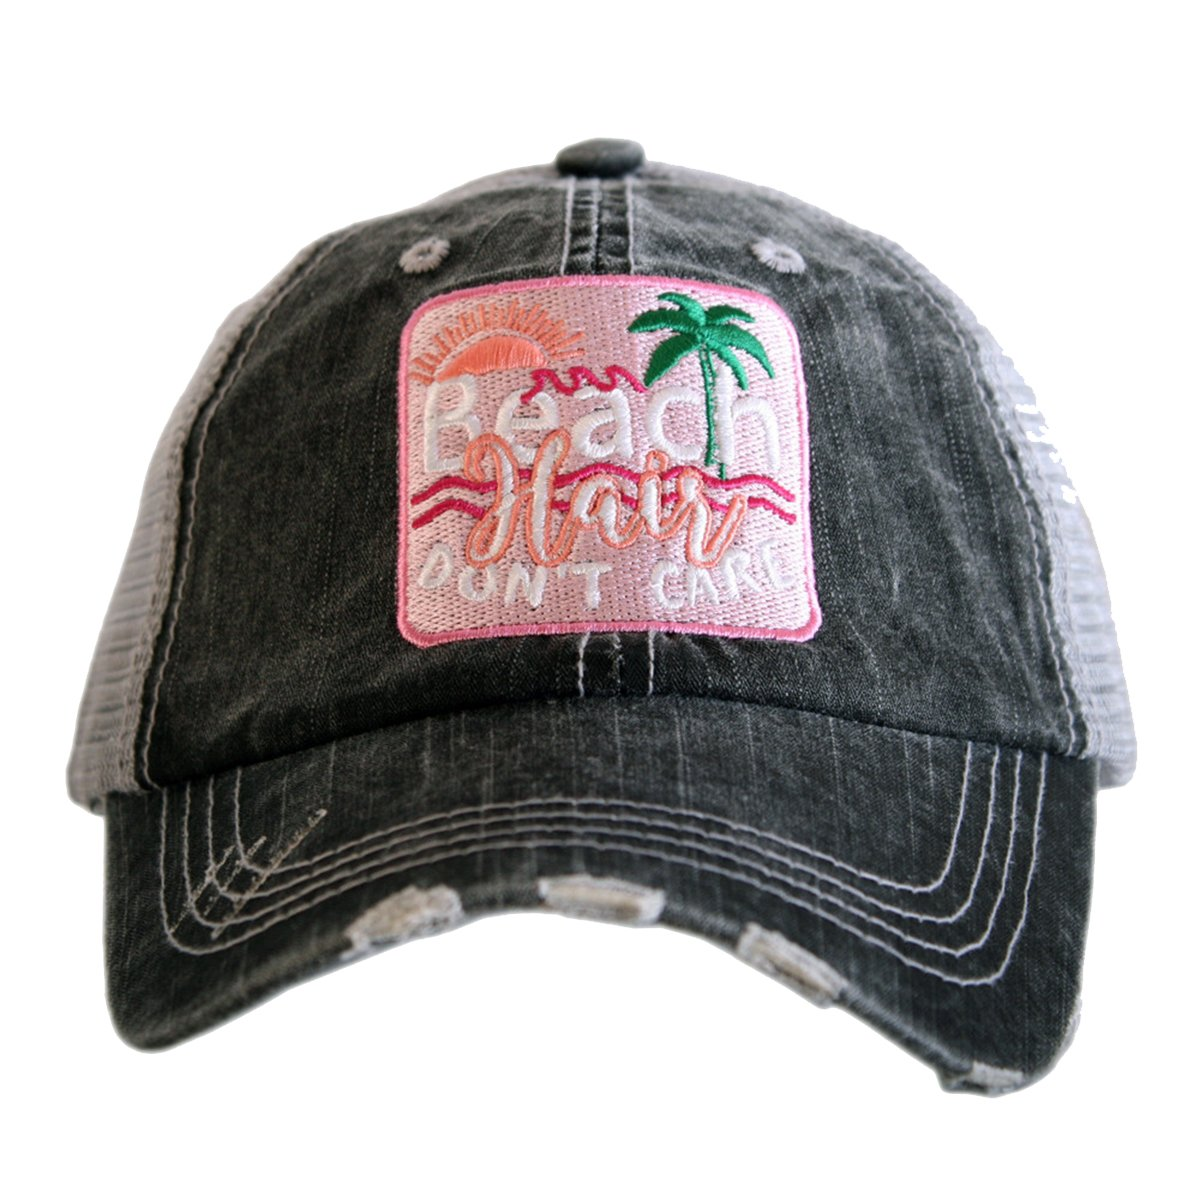 Katydid Beach Hair Don't Care Palm Patch Women's Trucker Hat